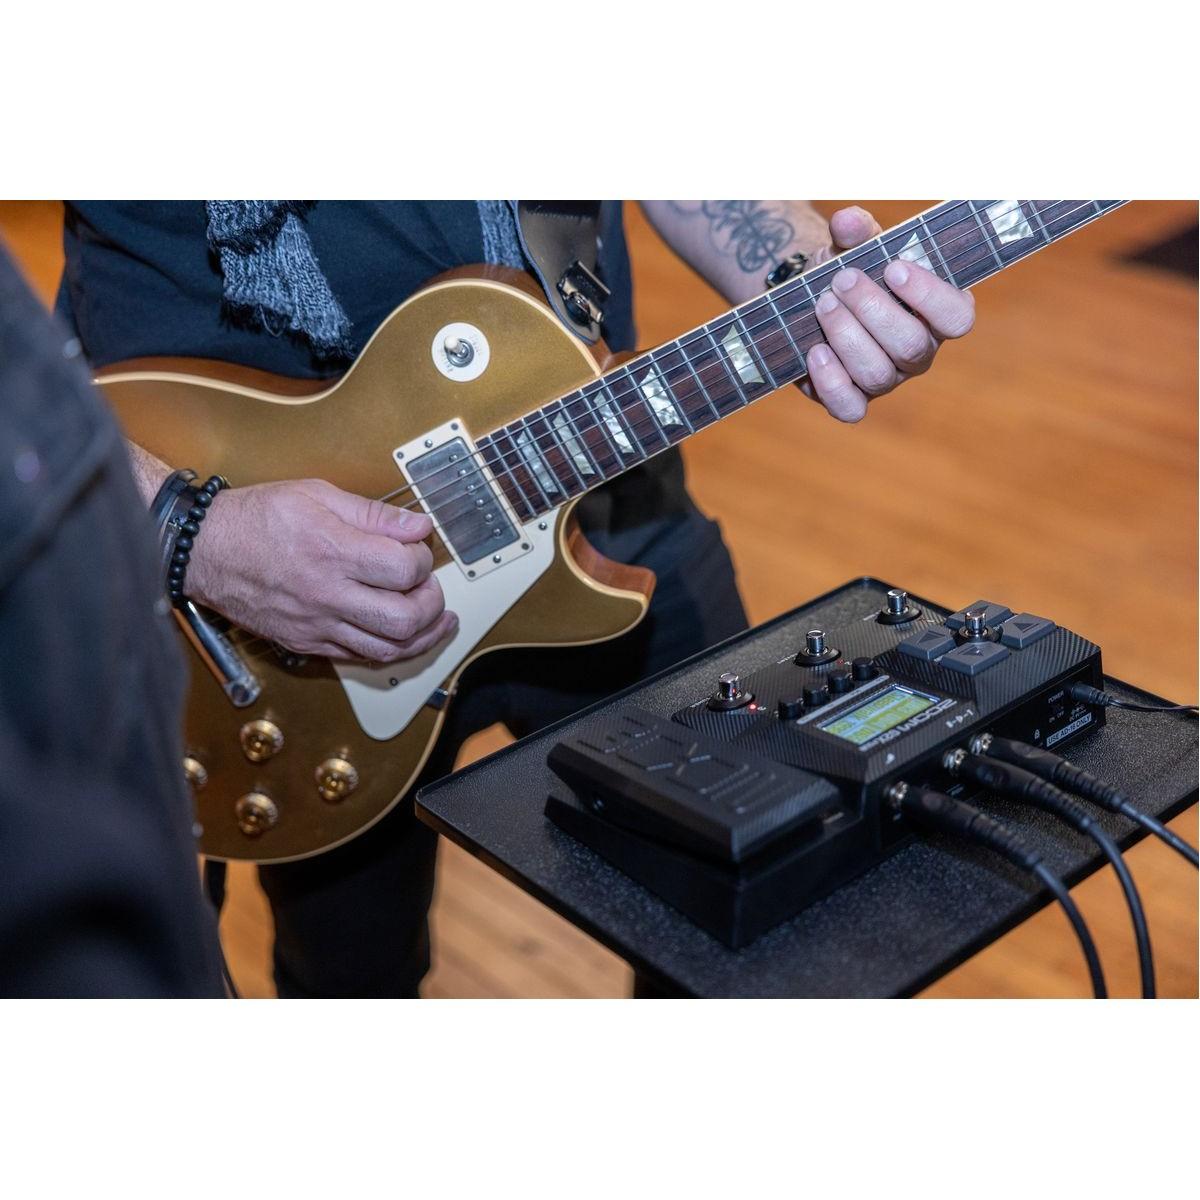 ERNIE BALL 9190 PLETTRI EVERLAST ORANGE 0.73MM SET/12